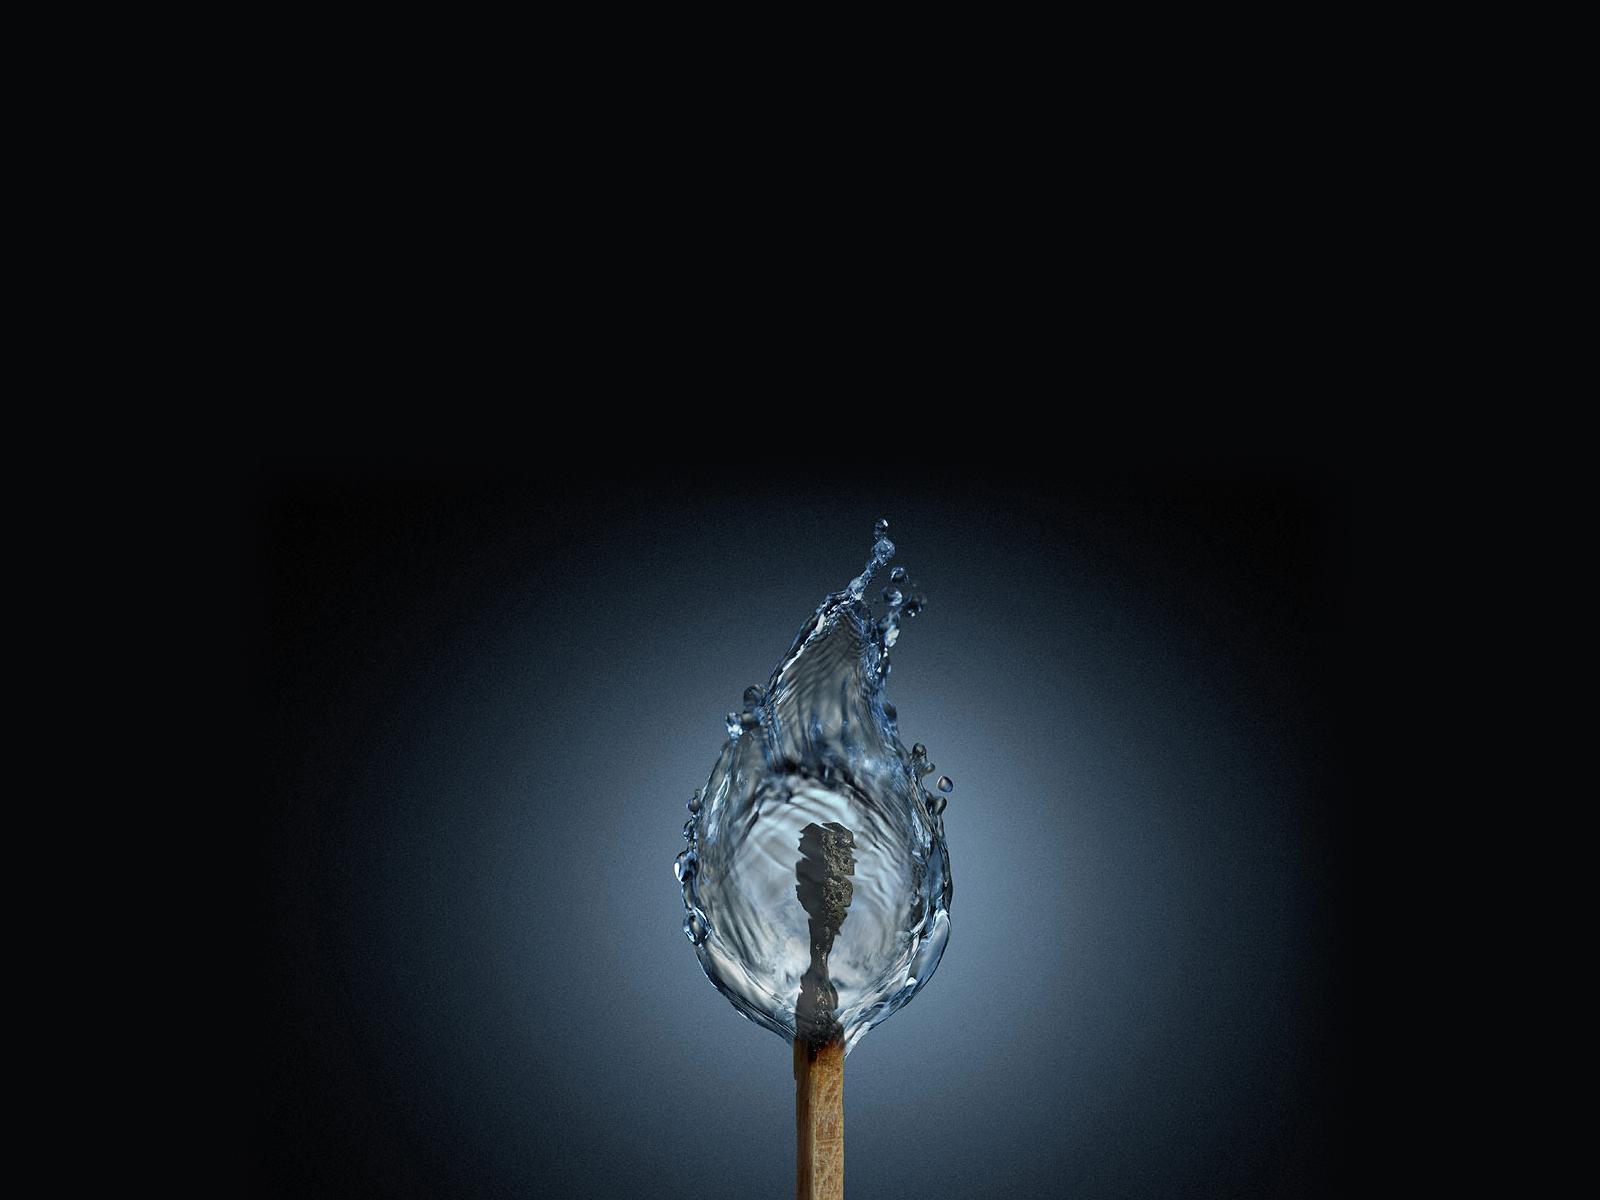 http://1.bp.blogspot.com/--S3elOFDaNQ/TntOpOsl1KI/AAAAAAAAPzE/VwtcD9Rrz3o/s1600/Fuego-de-Agua-HD_11.jpg